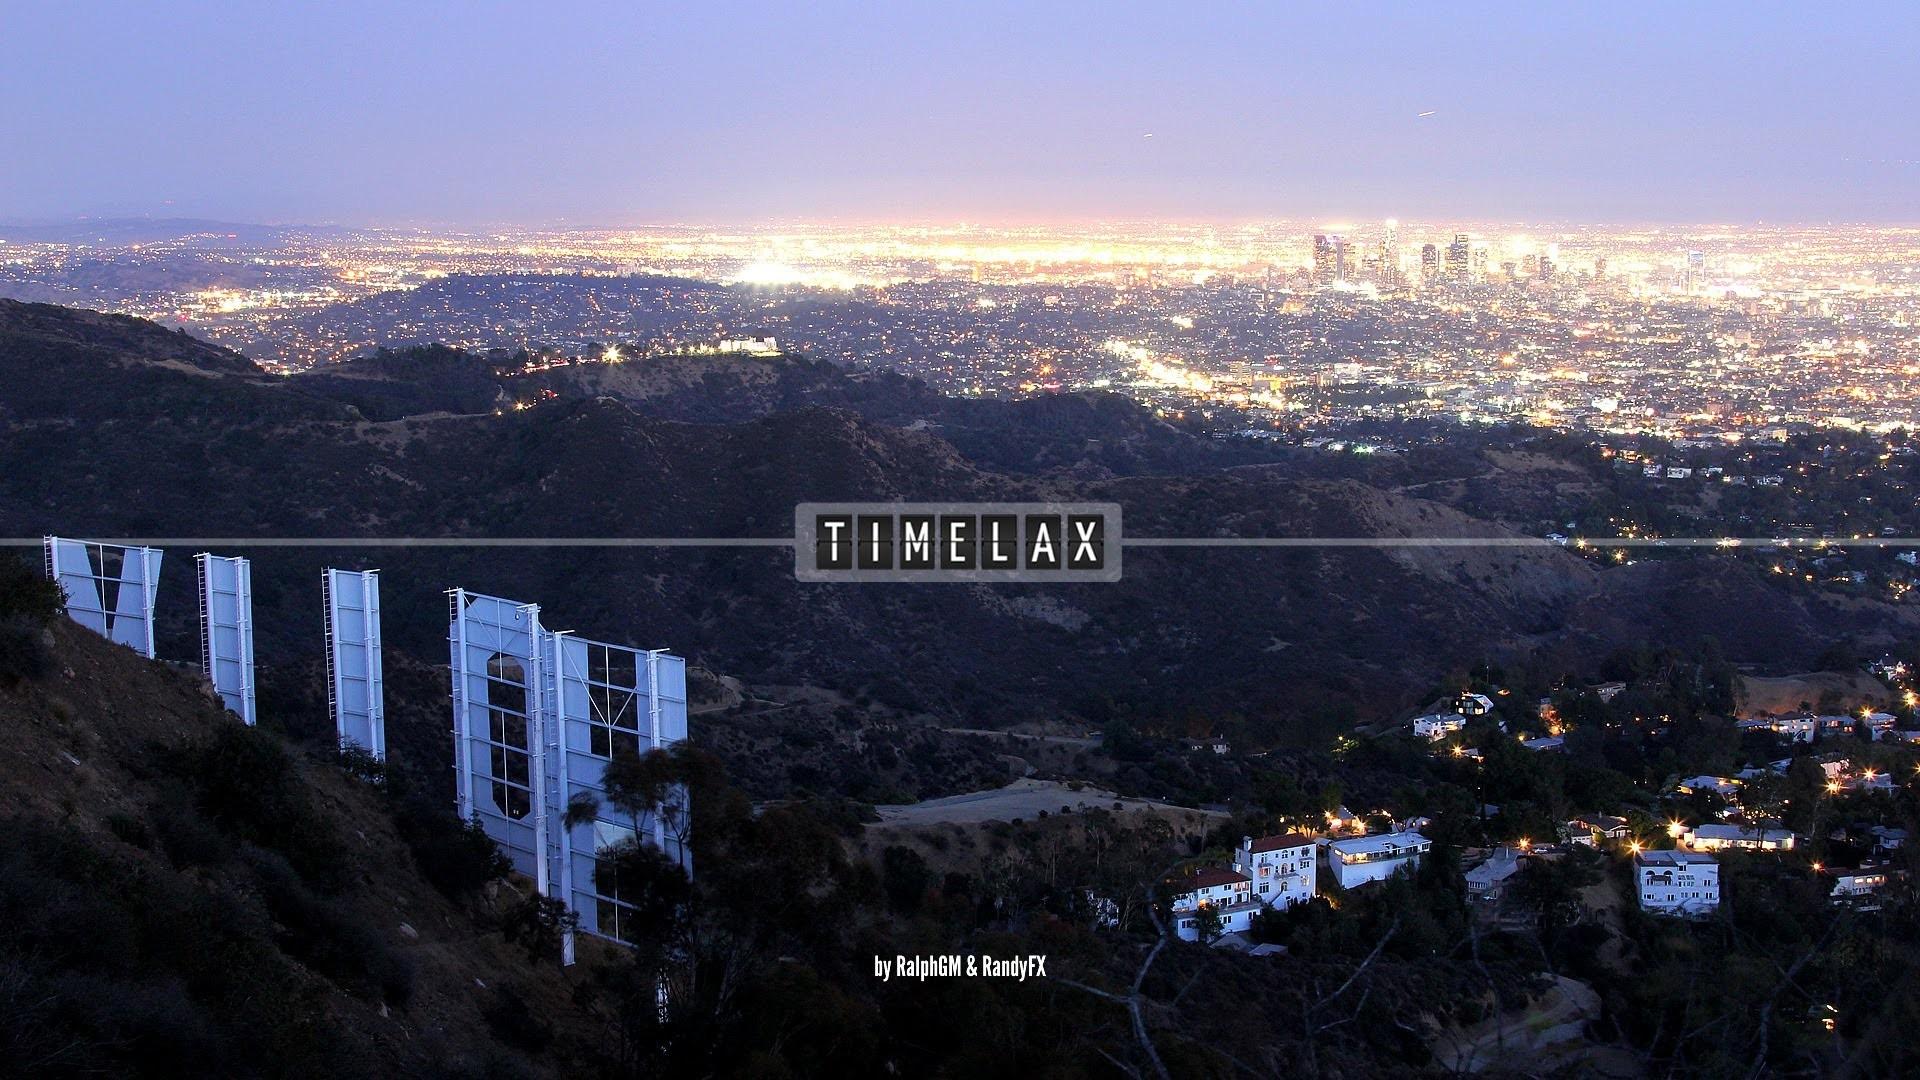 La Dodgers Iphone Wallpaper Los Angeles Hd Wallpapers 1080p 73 Images